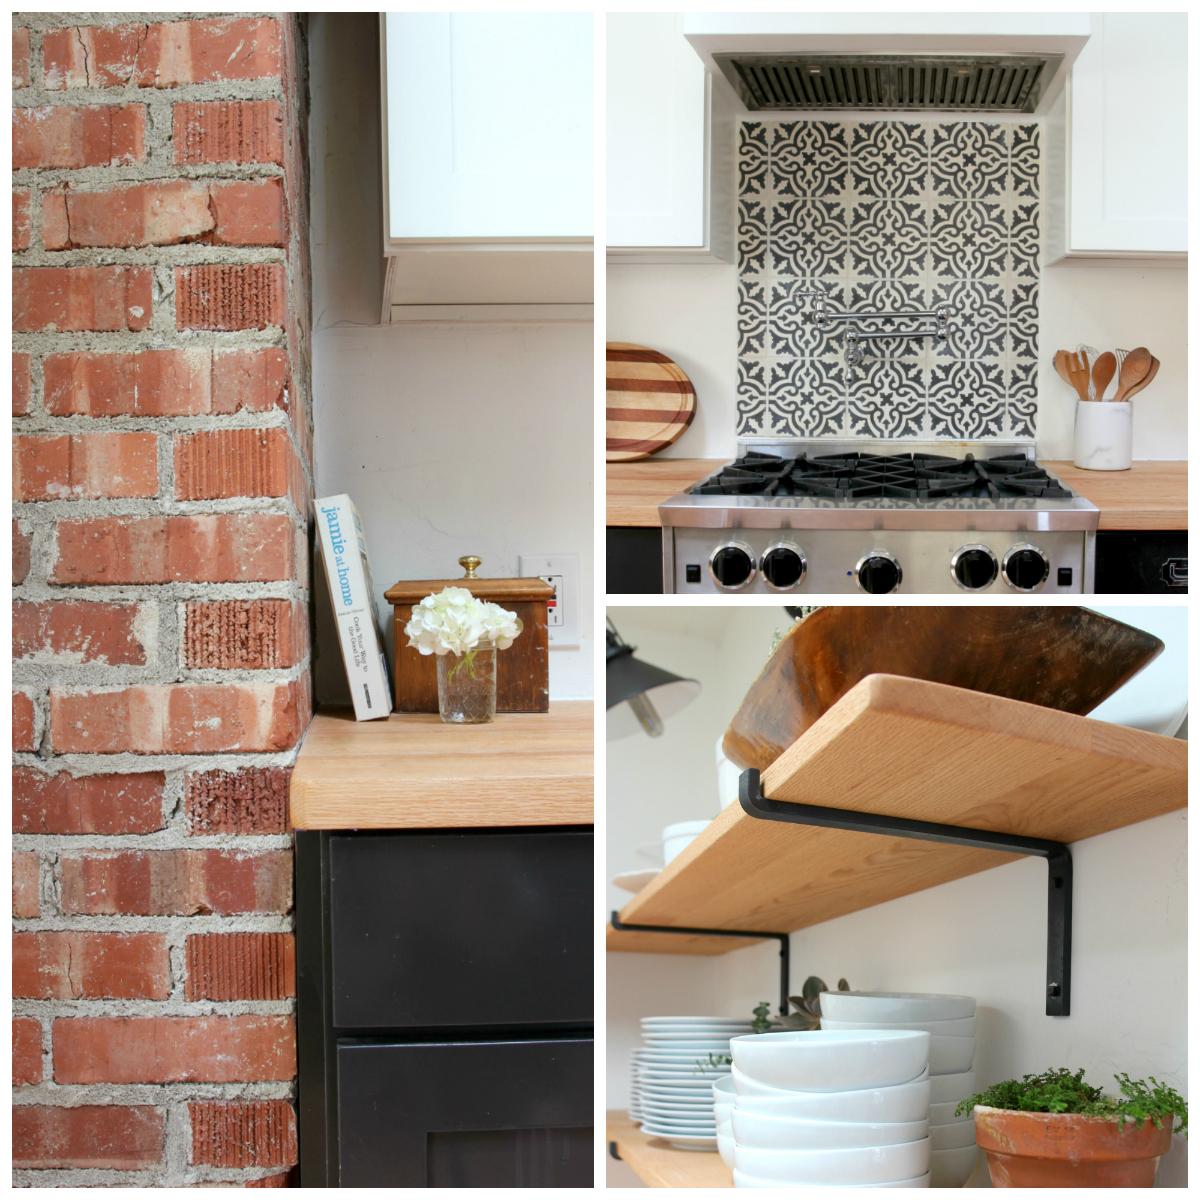 The Grit and Polish - Dexter Kitchen Renovation Details Collage 2